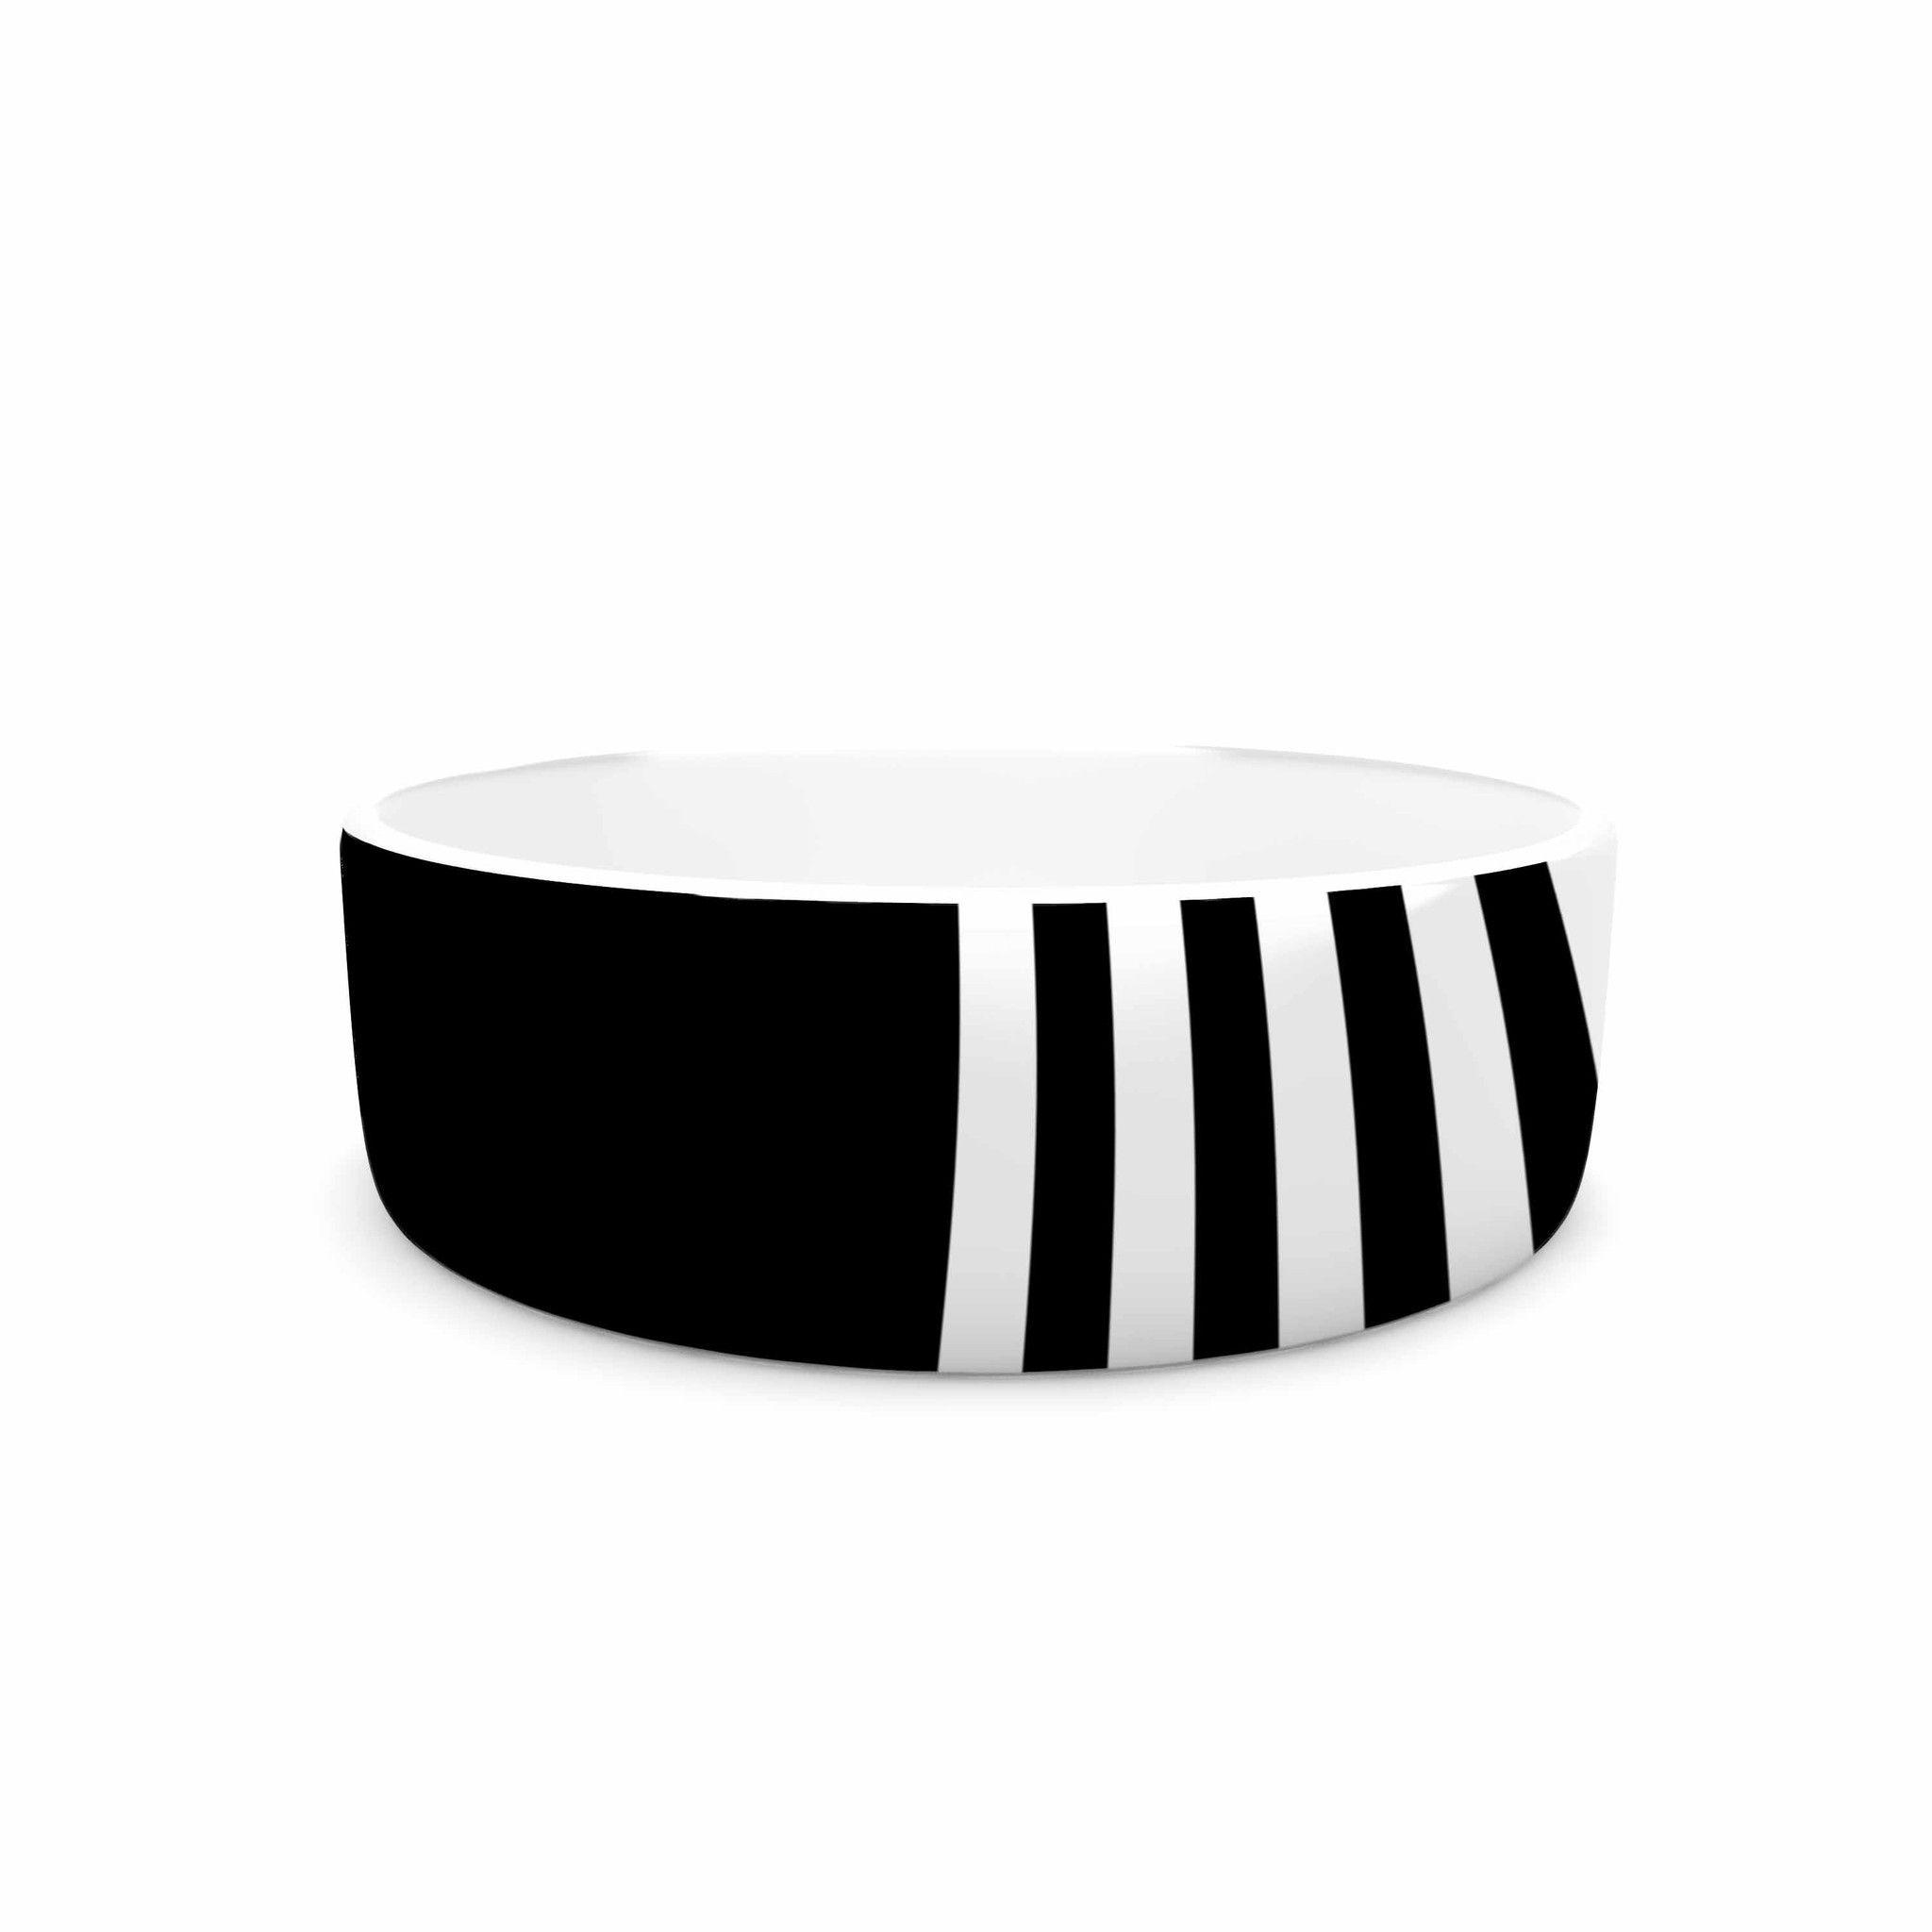 "Trebam ""Roletna"" Black White Pet Bowl"